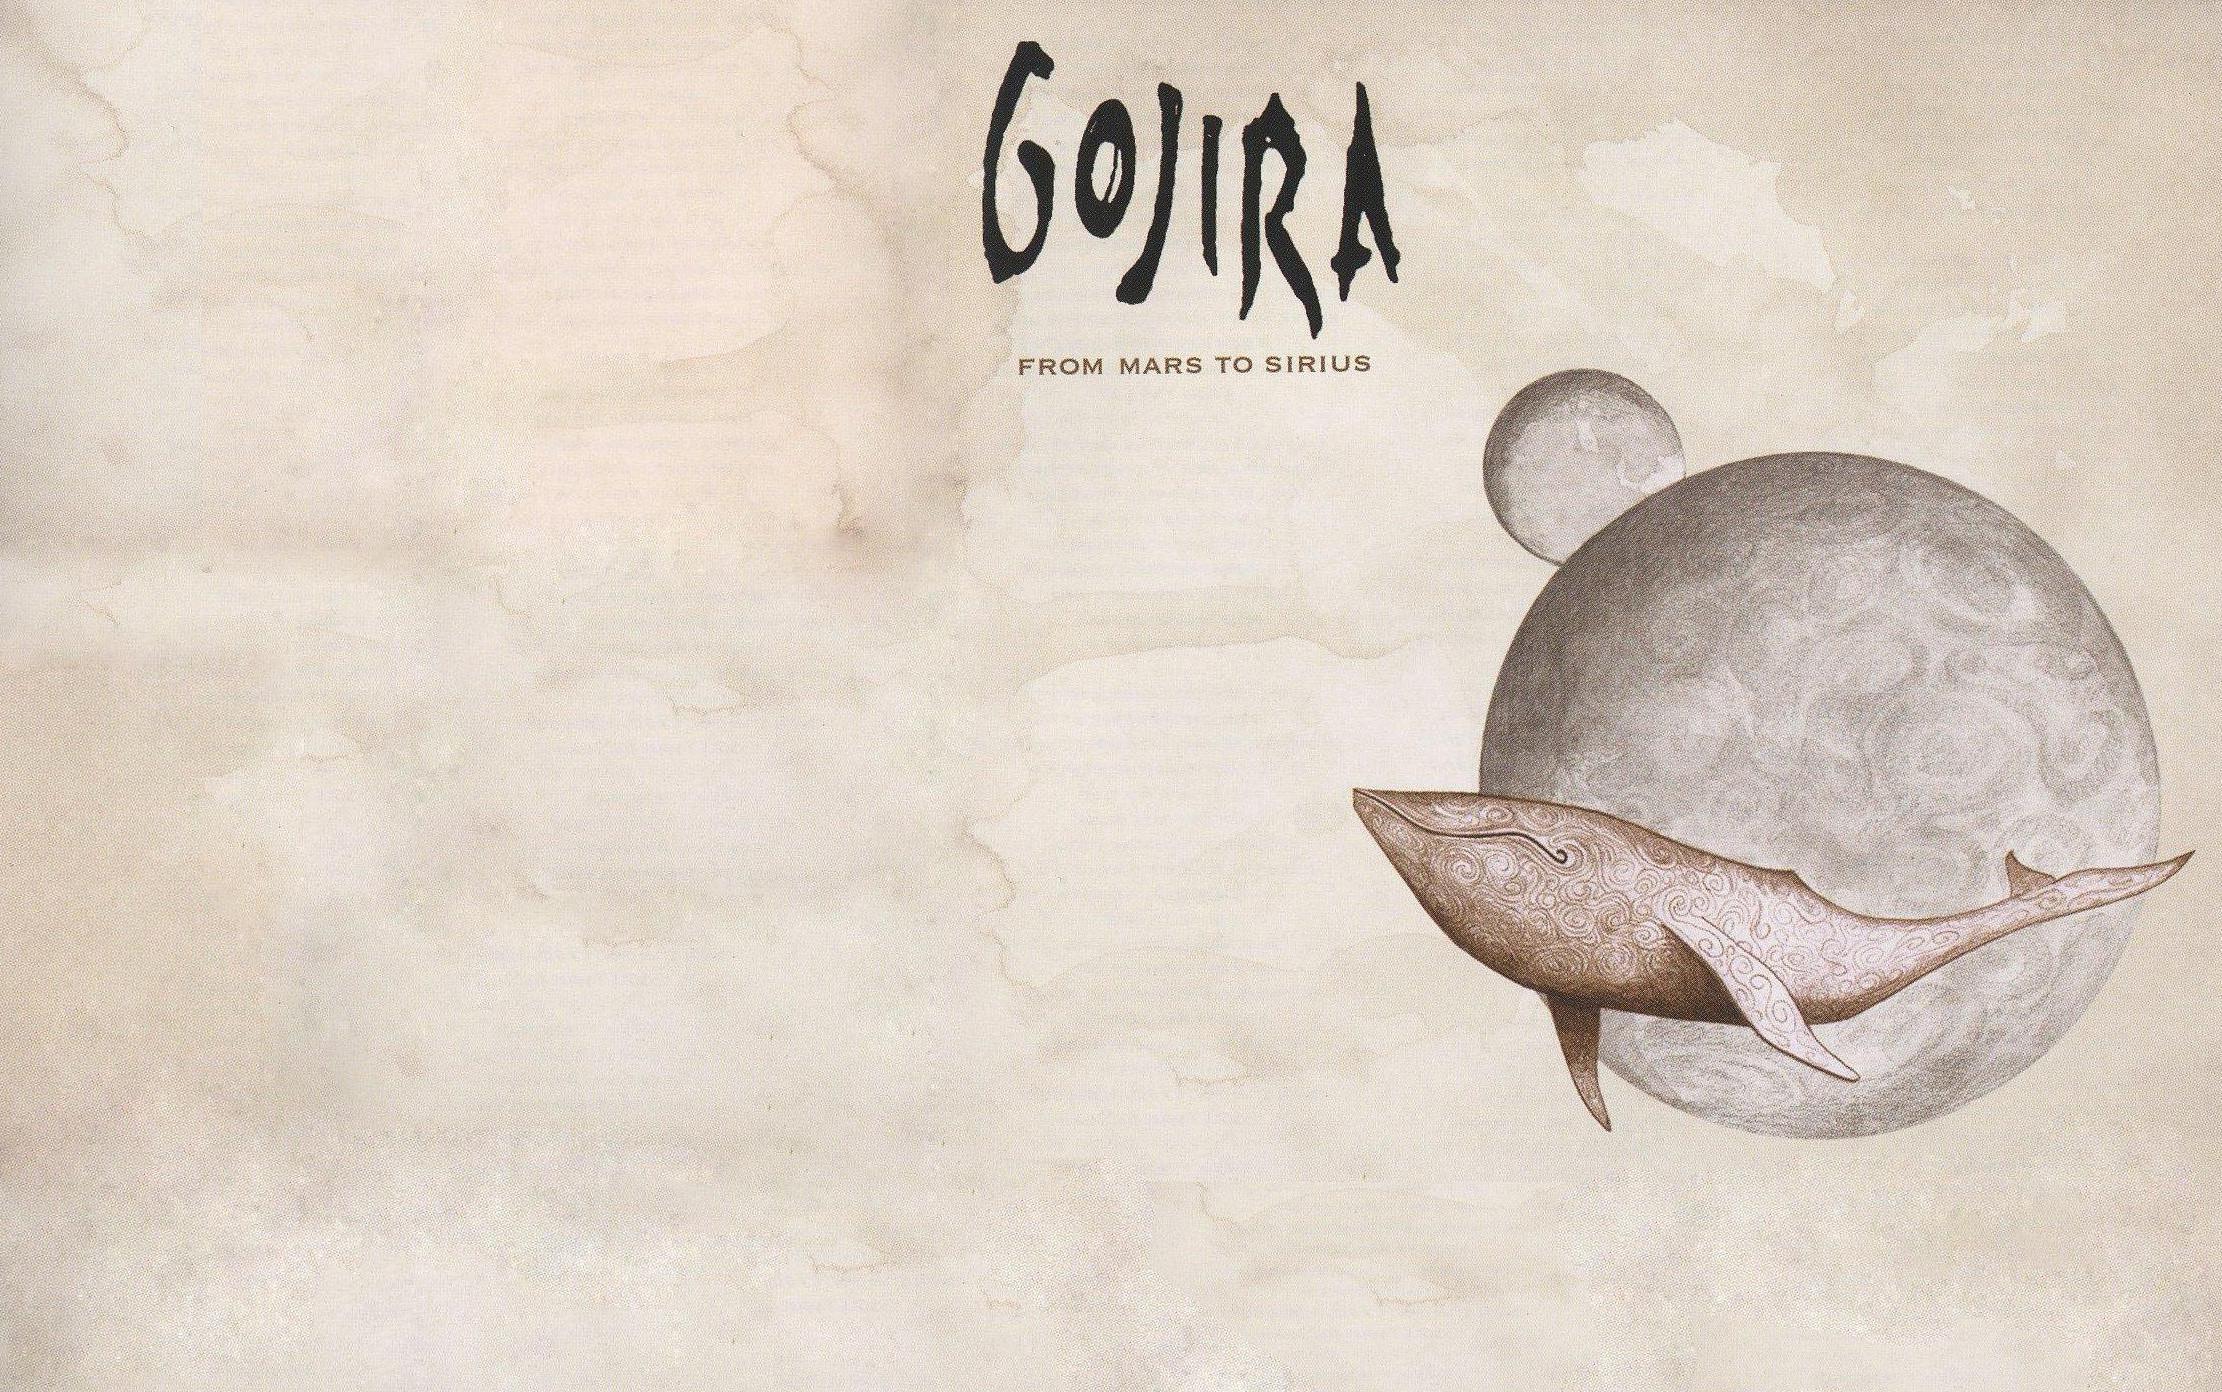 75 Gojira Wallpapers on WallpaperPlay 2222x1392